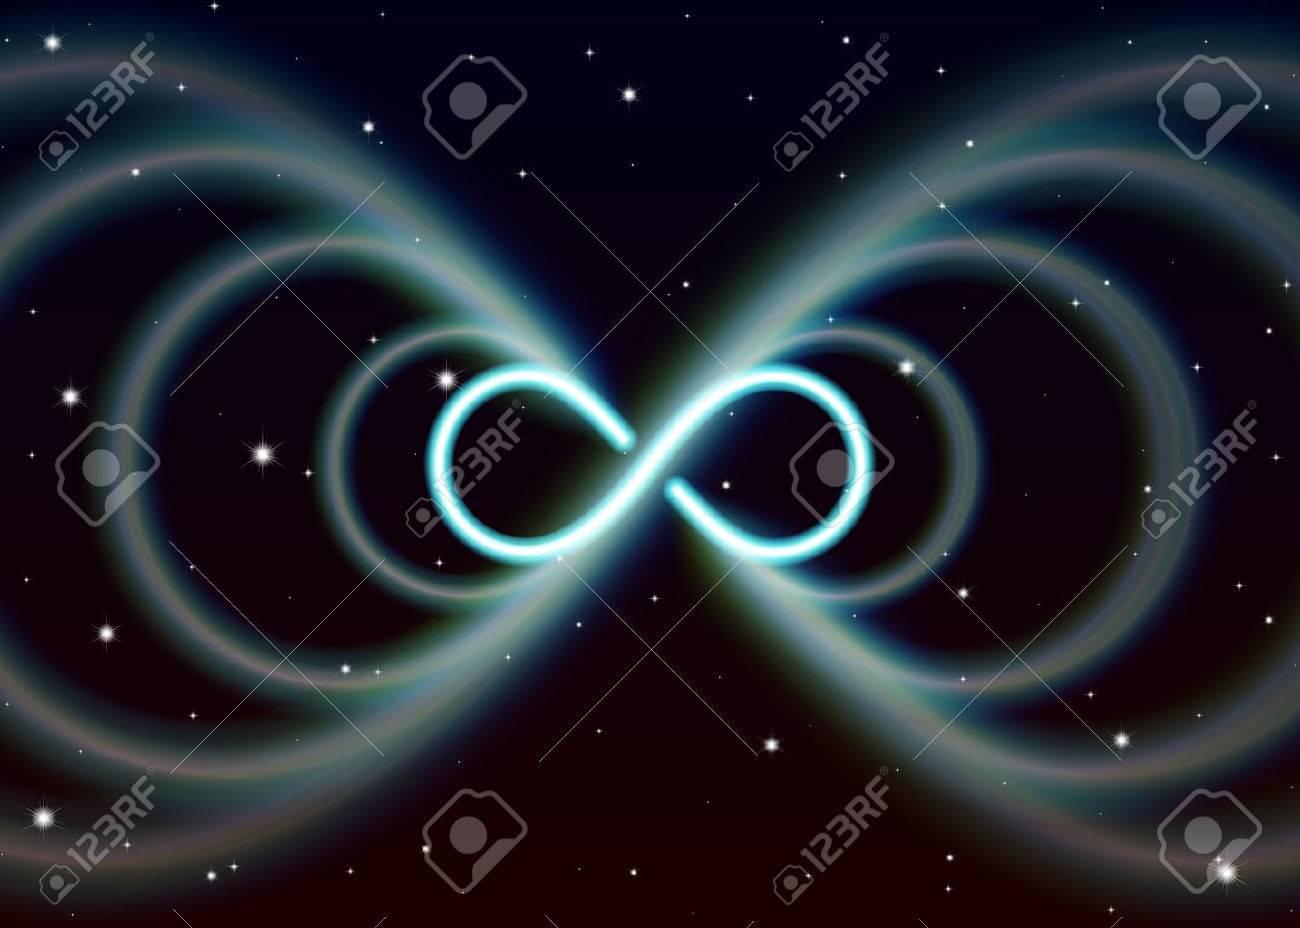 Magic lemniscate symbol infinity or sideways eight spreads the magic lemniscate symbol infinity or sideways eight spreads the mystic energy in spiritual space stock biocorpaavc Gallery